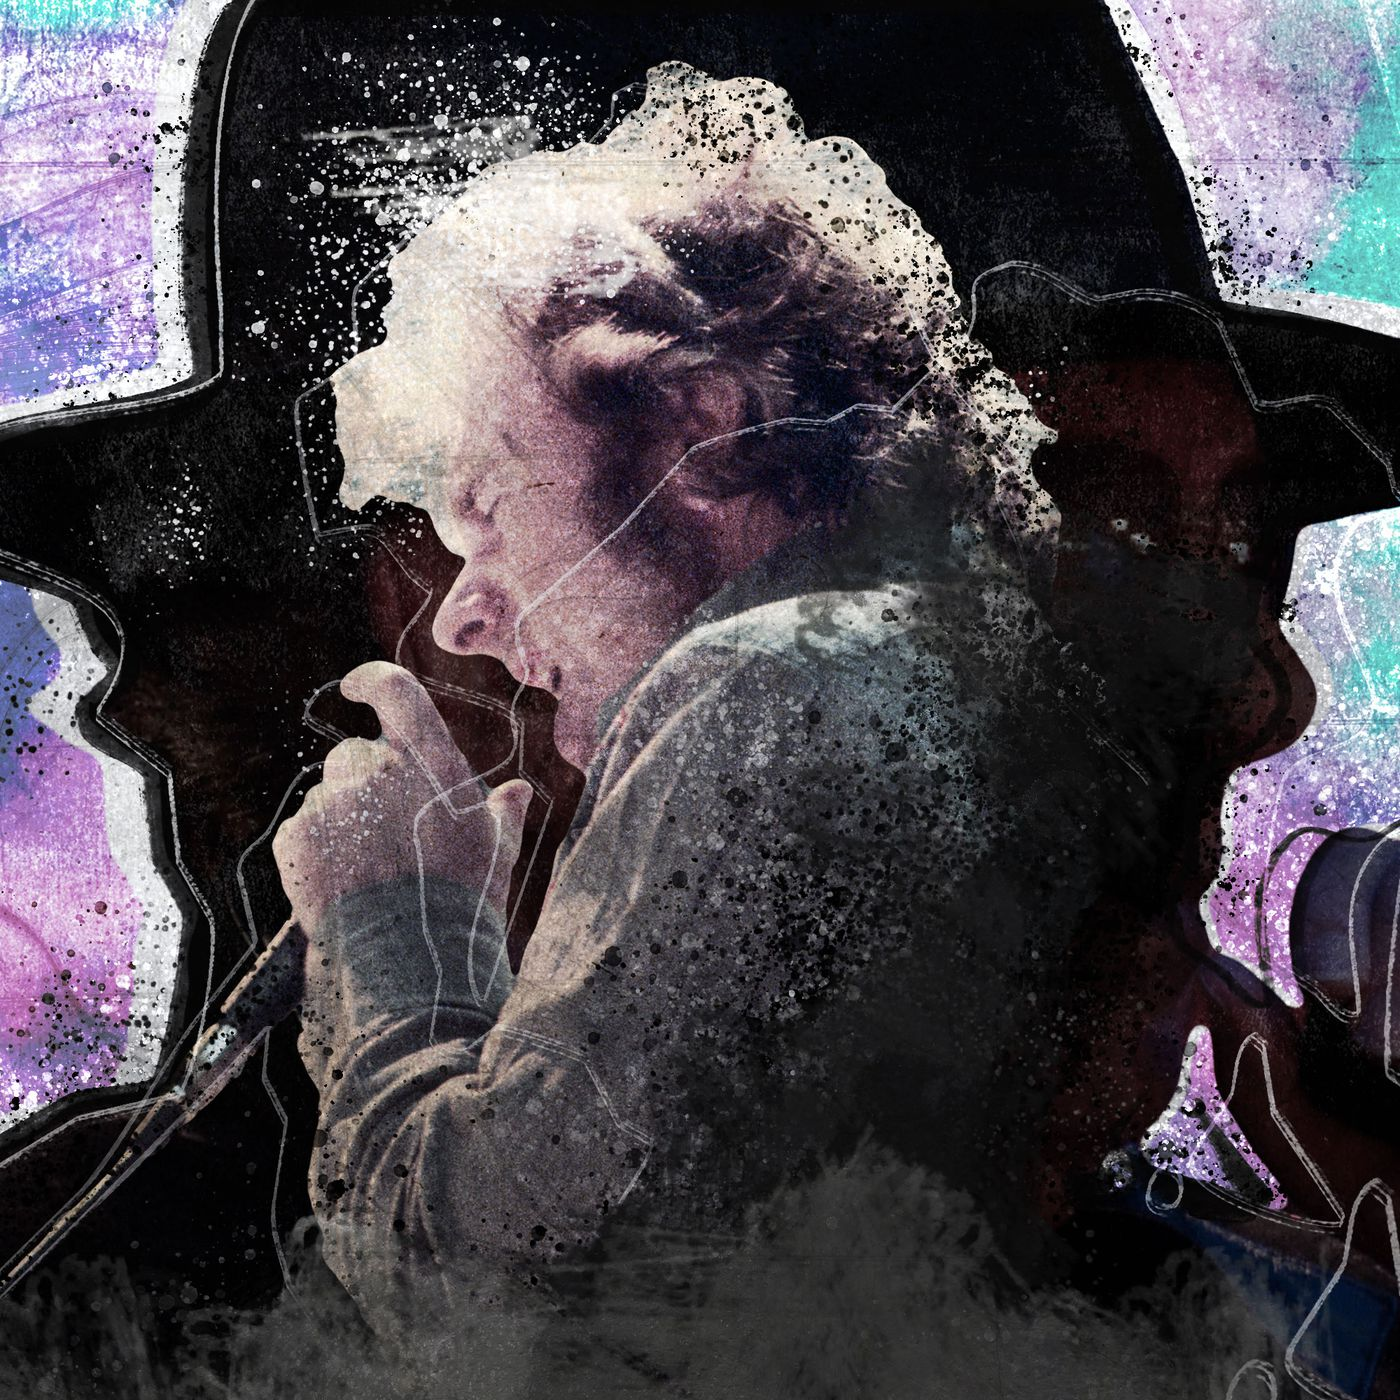 Van Morrison: The Pettiest Musical Genius of His Time - The Ringer